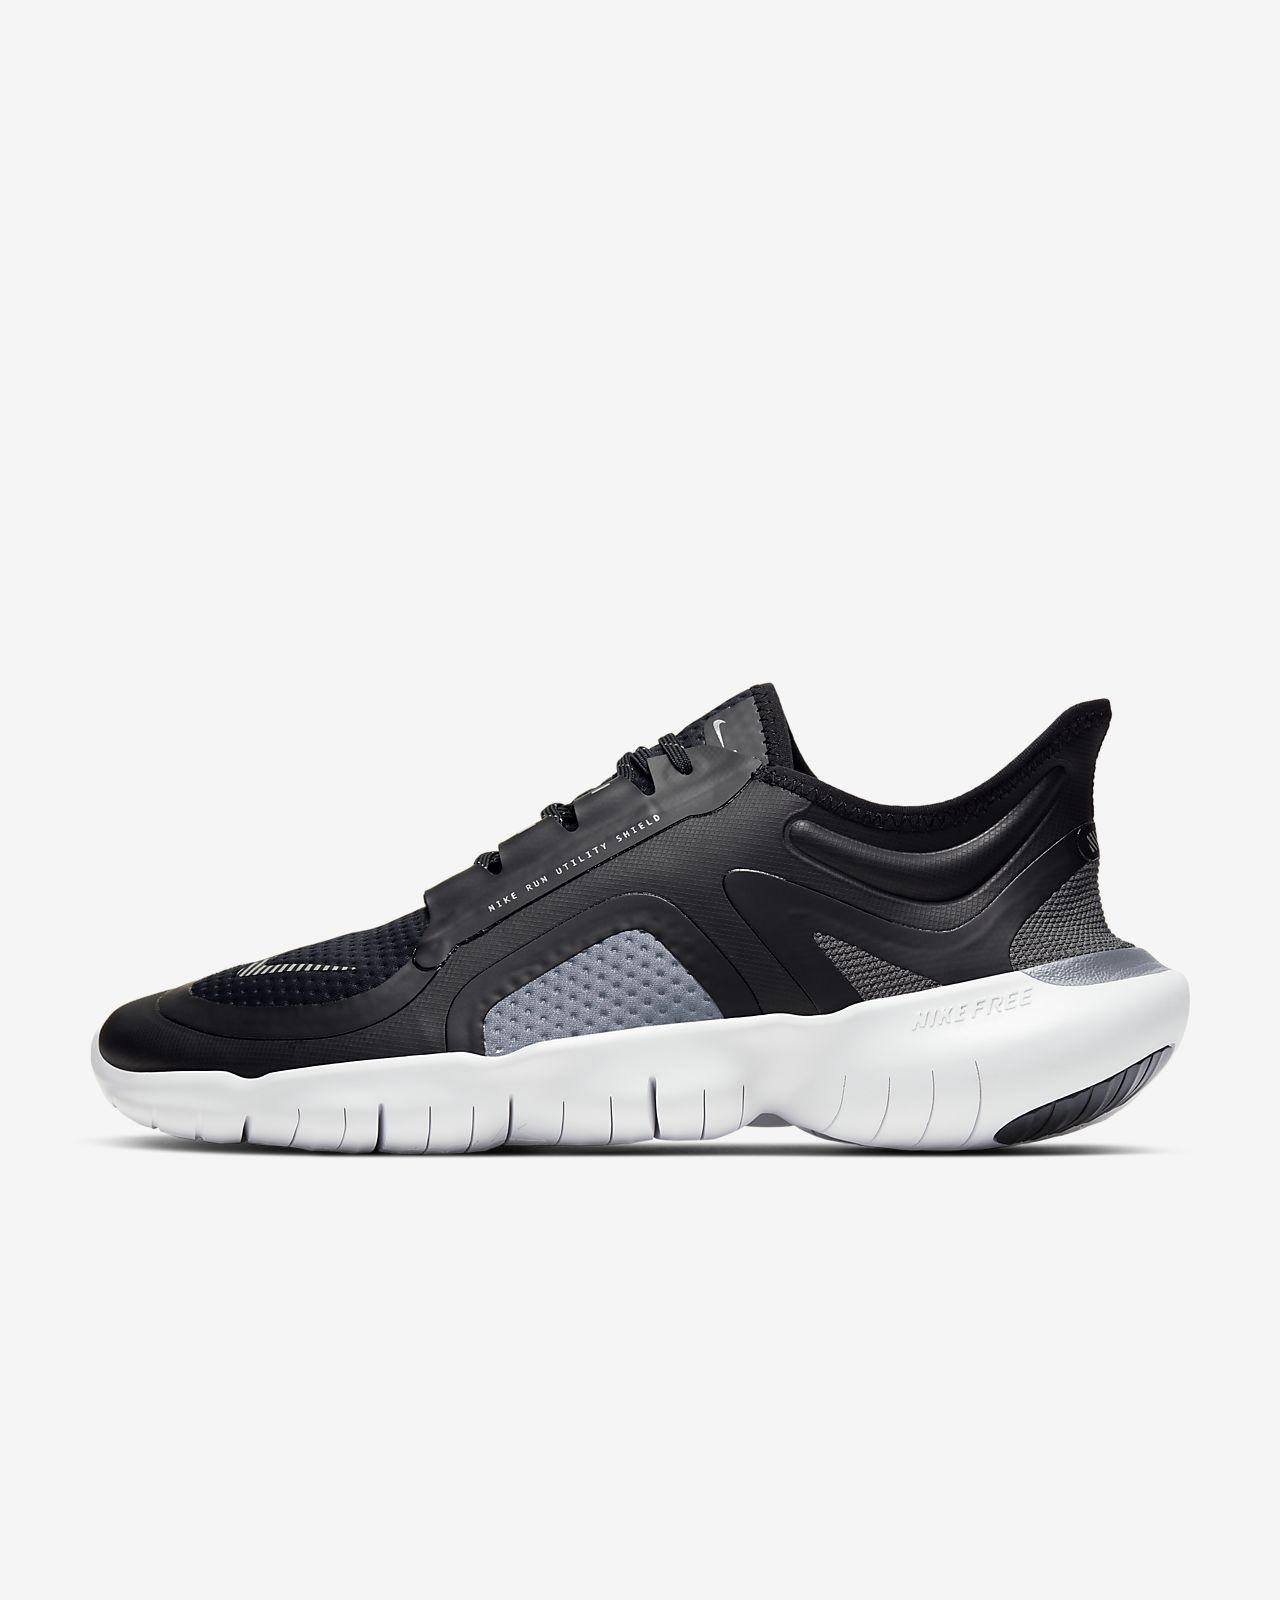 Мужские беговые кроссовки Nike Free RN 5.0 Shield